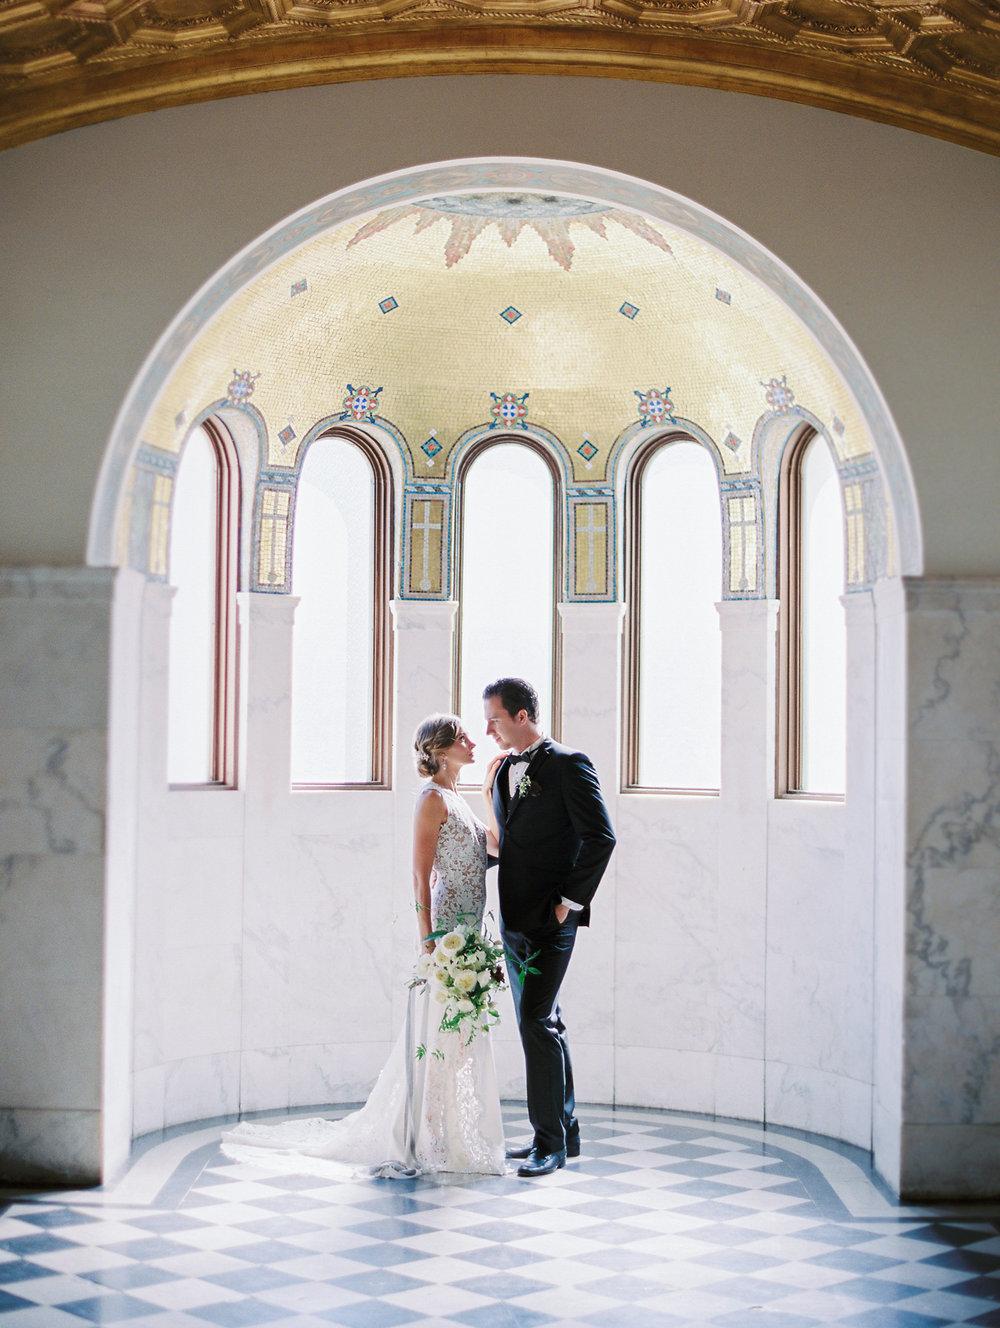 Vibiana-Wedding-Inspired-Shoot-57.jpg